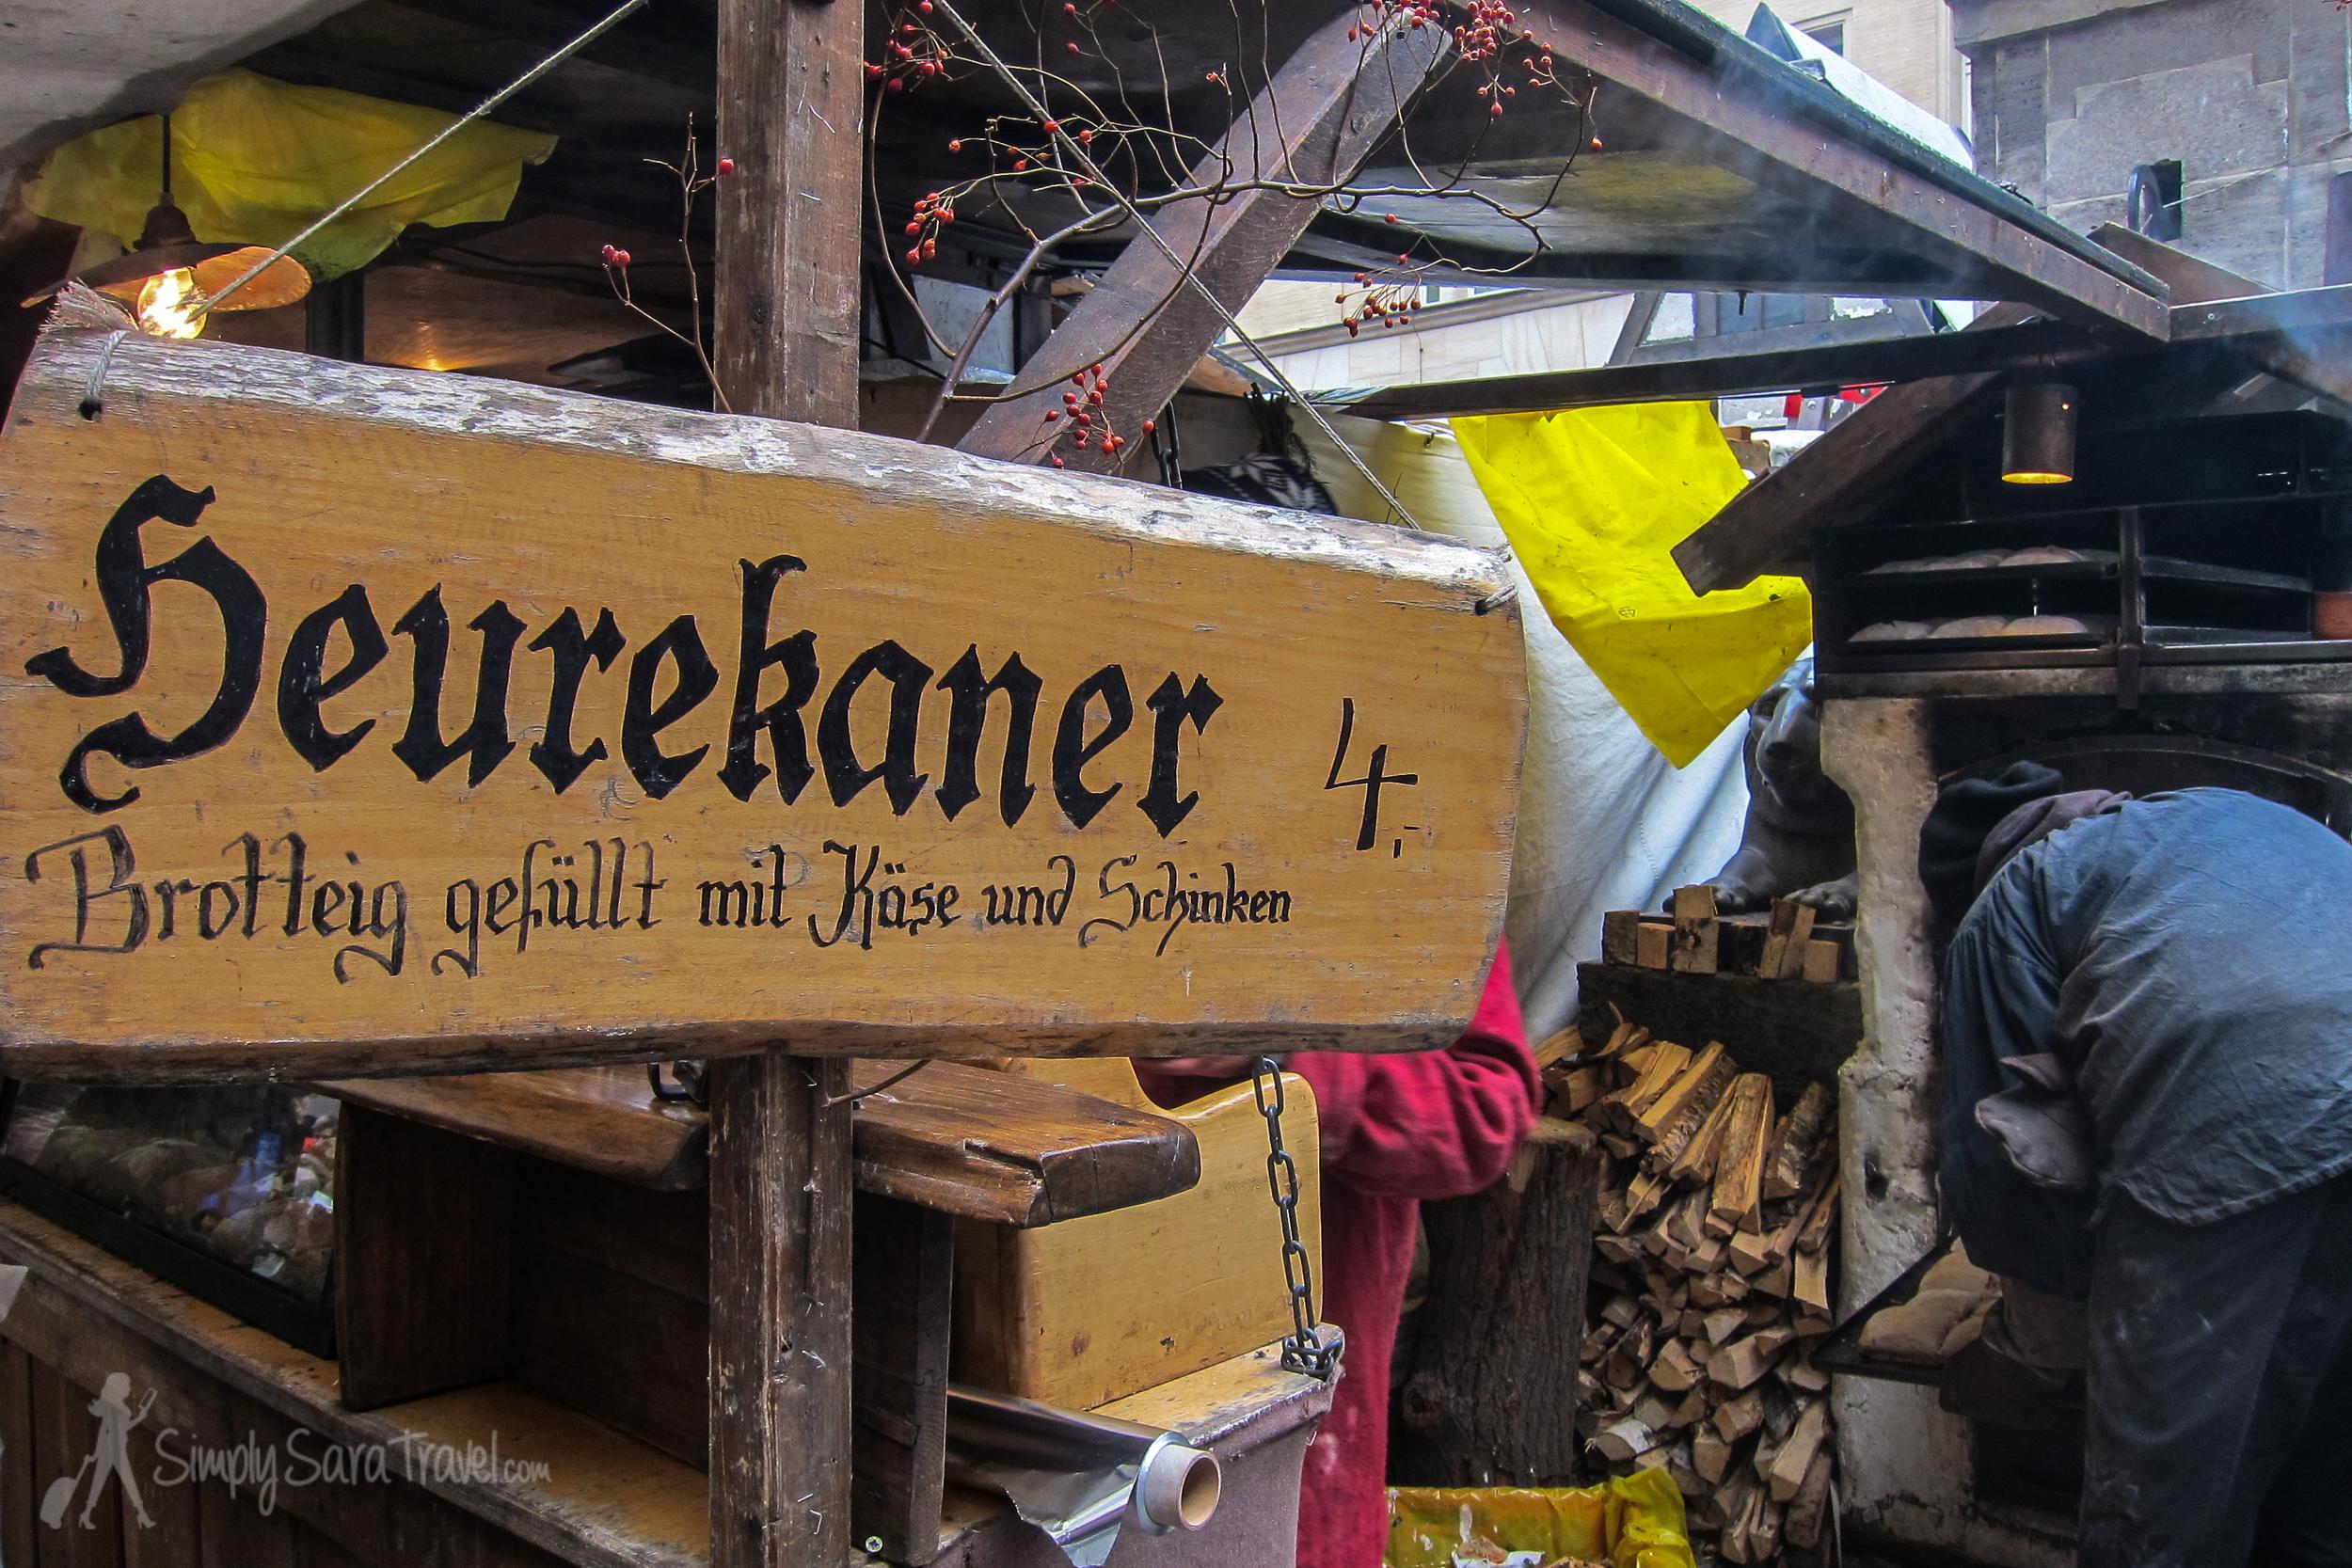 Heurekaner stand at Leipzig, Germany Christmas market